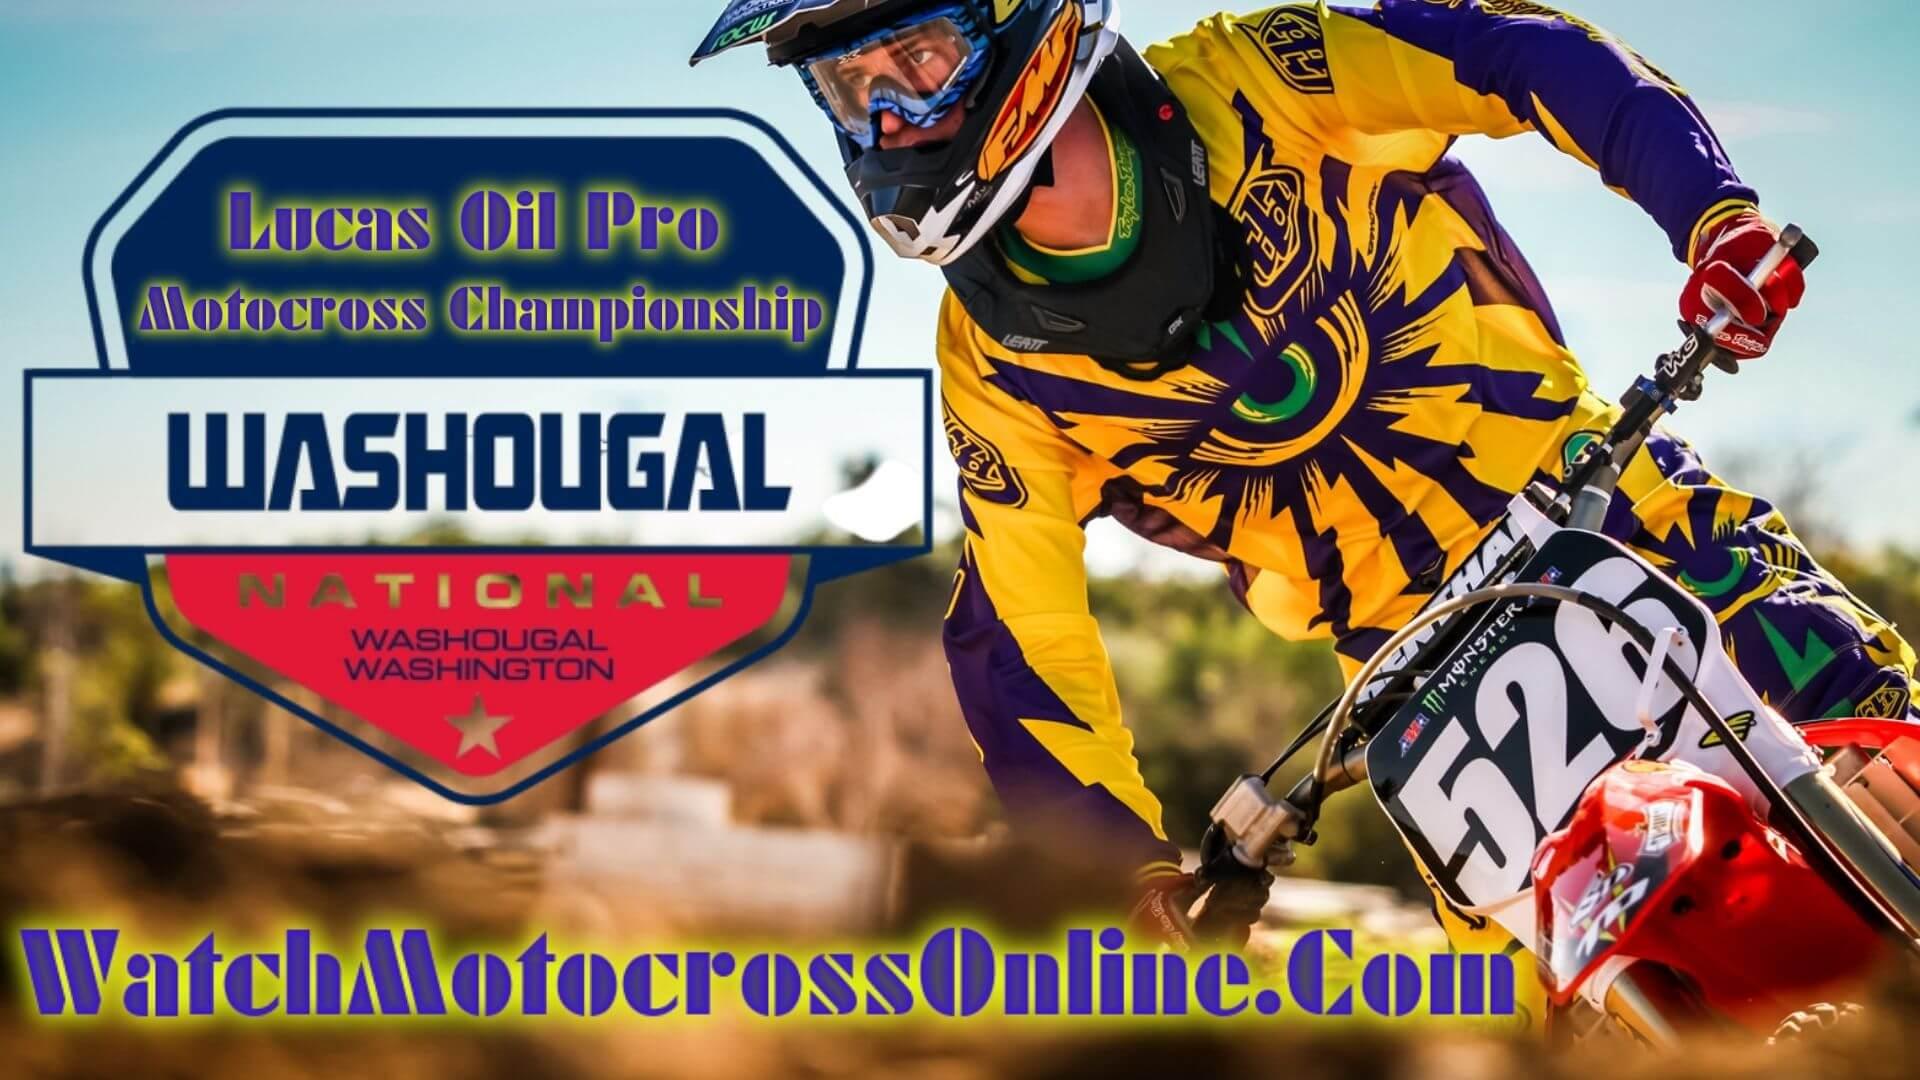 Washougal : Pro Motocross Live Stream - 2020 - Video On Demand